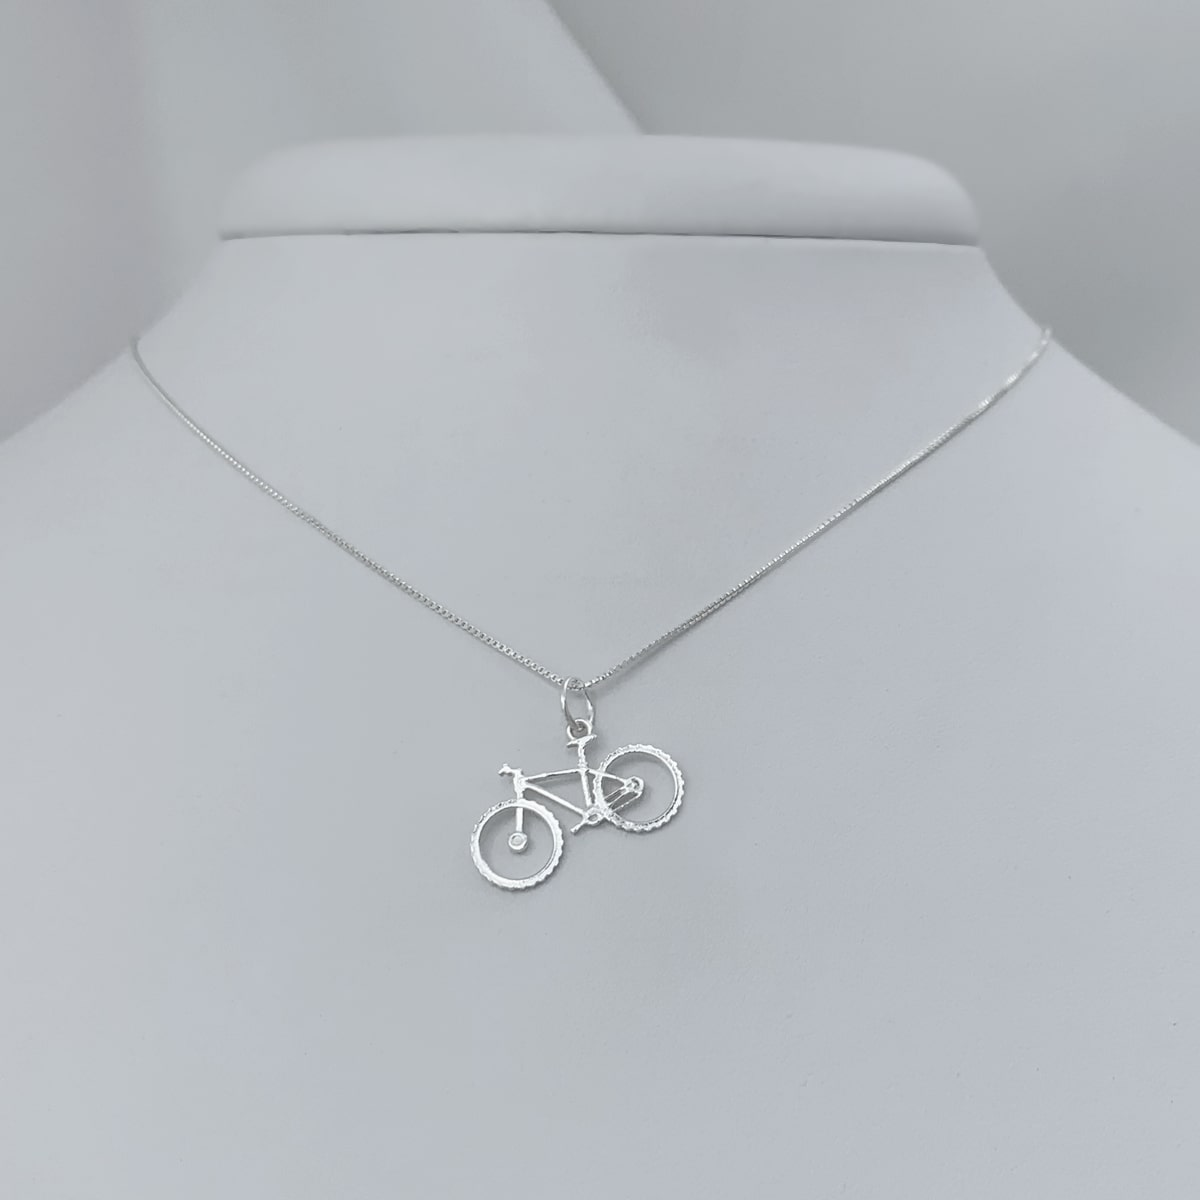 Colar de Prata, Bicicleta, Bike